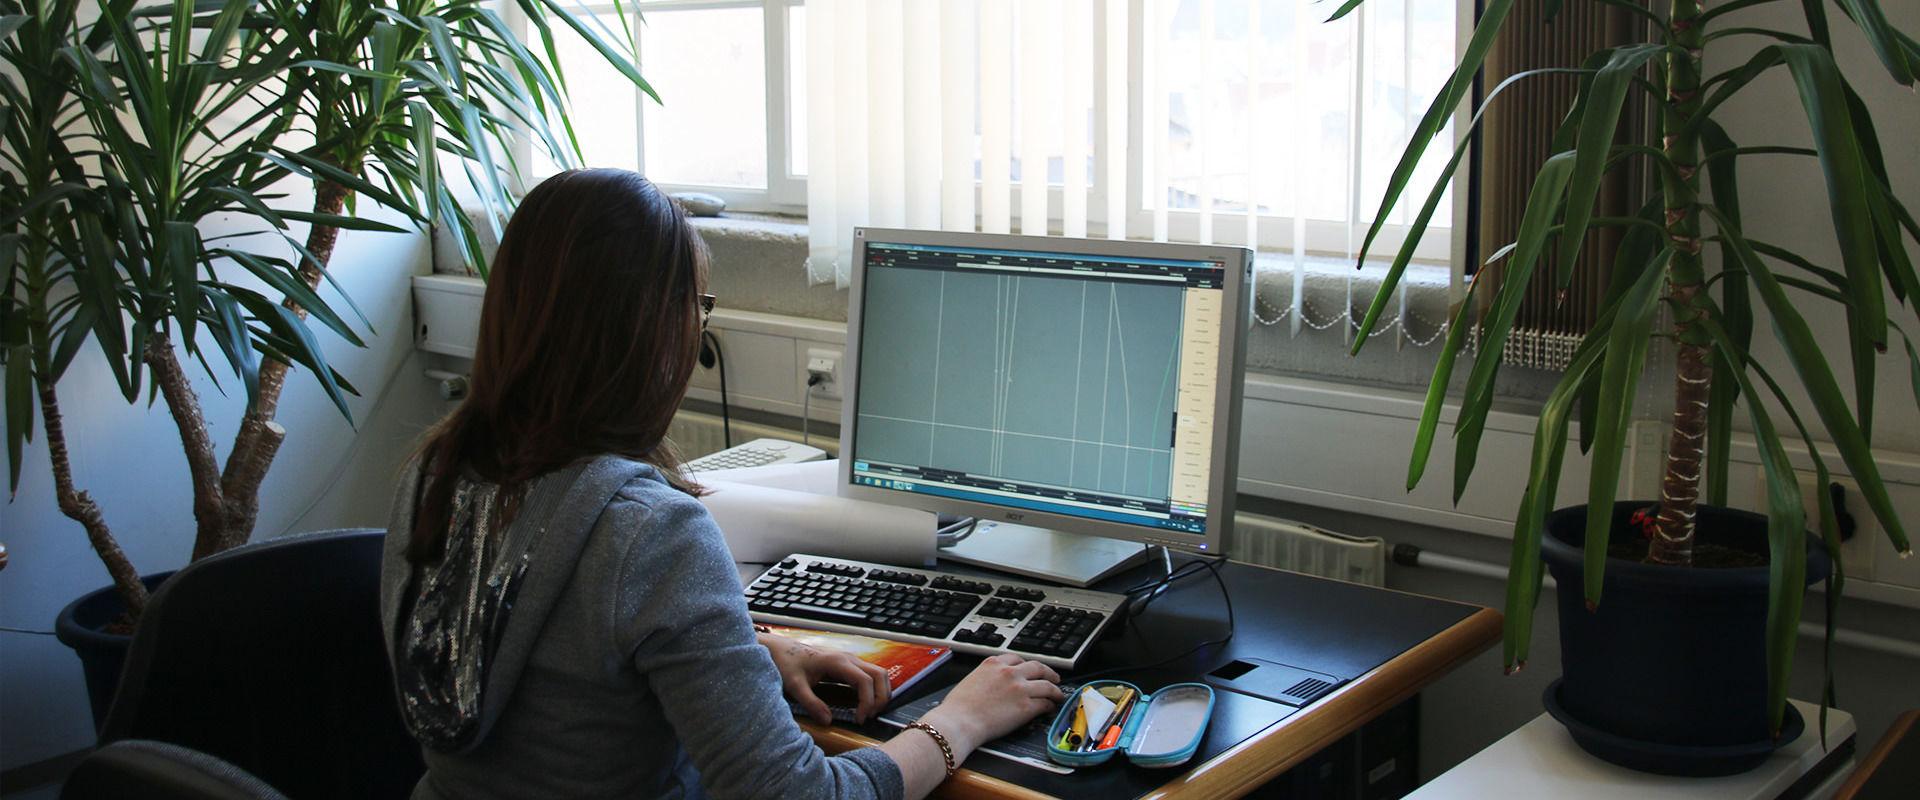 Textil- und Bekleidungstechnologie - Bachelorstudiengang